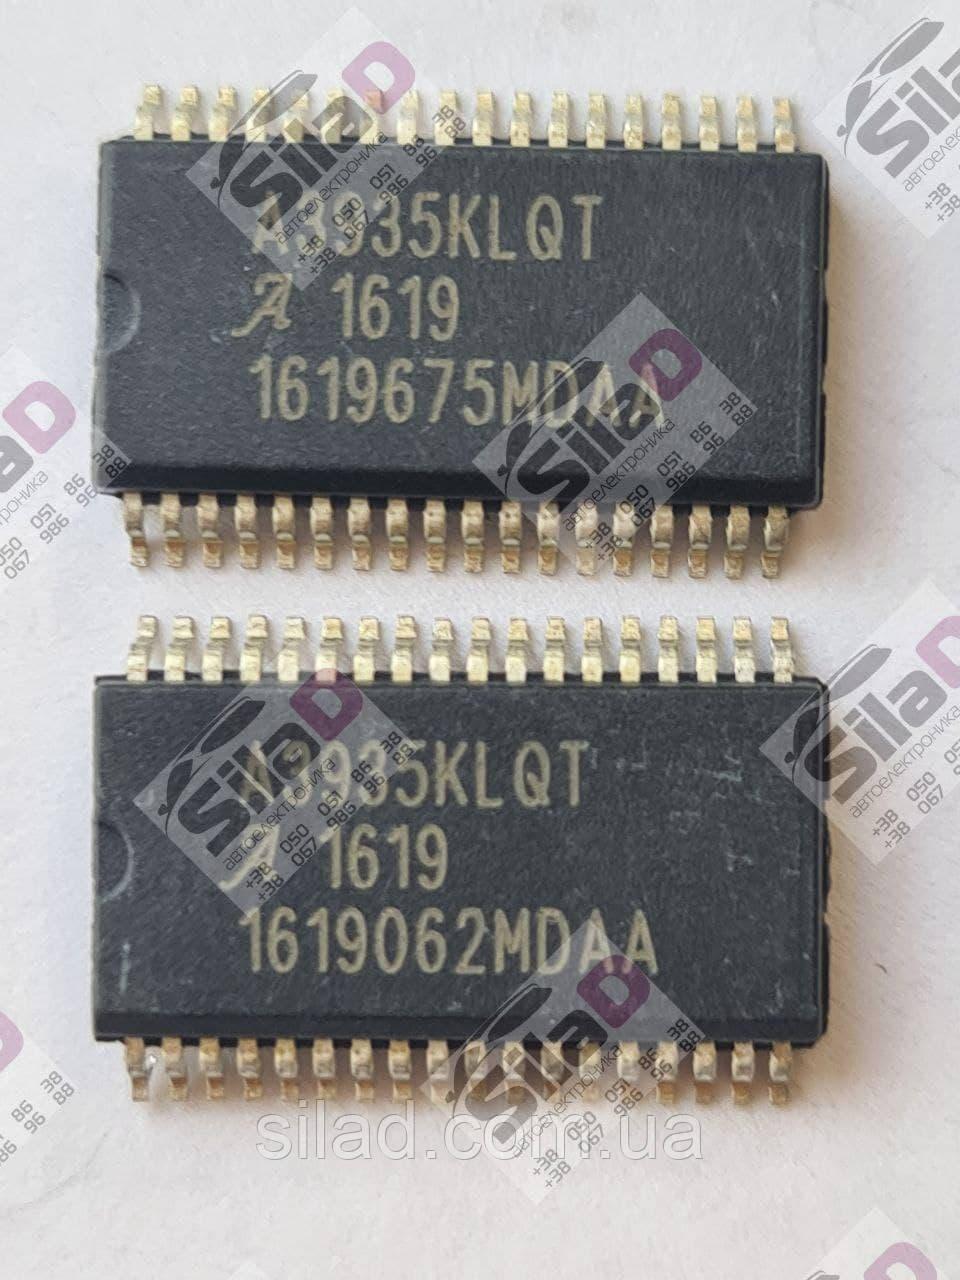 Мікросхема A3935KLQT Allegro MicroSystems корпус QSOP36